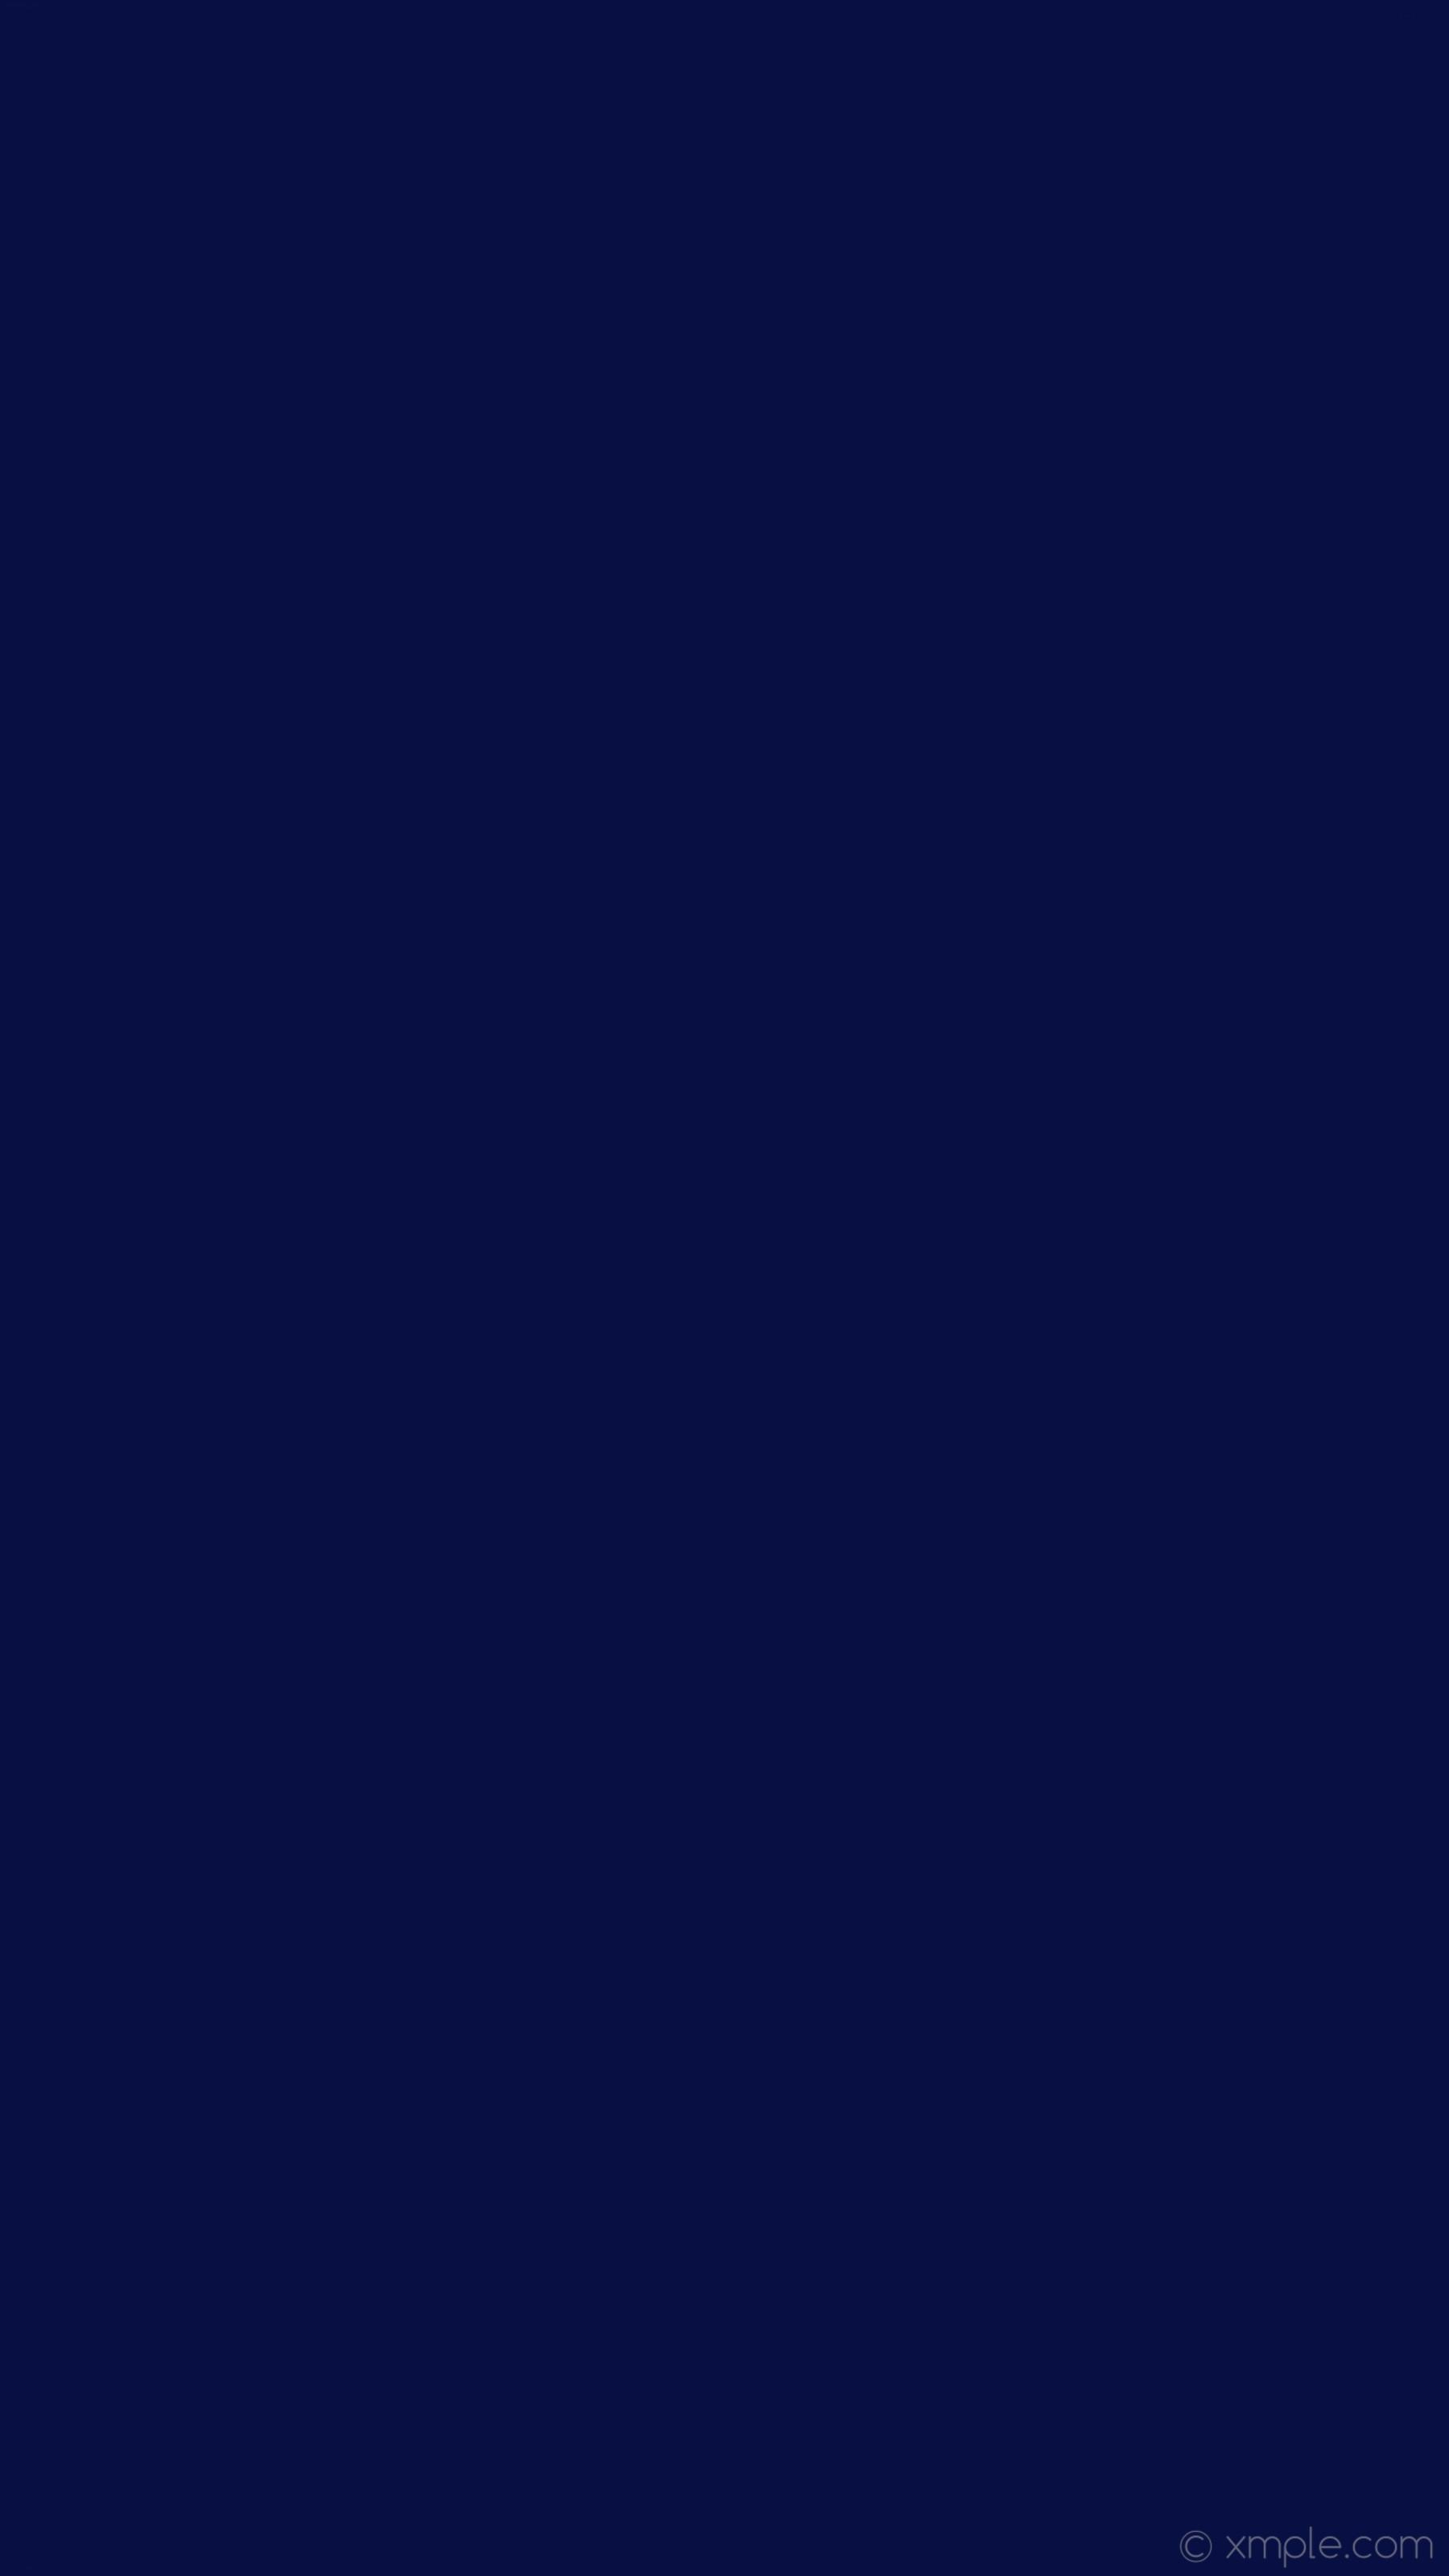 1920x1080 Wallpaper One Colour Blue Single Solid Color Plain Dark 02052a